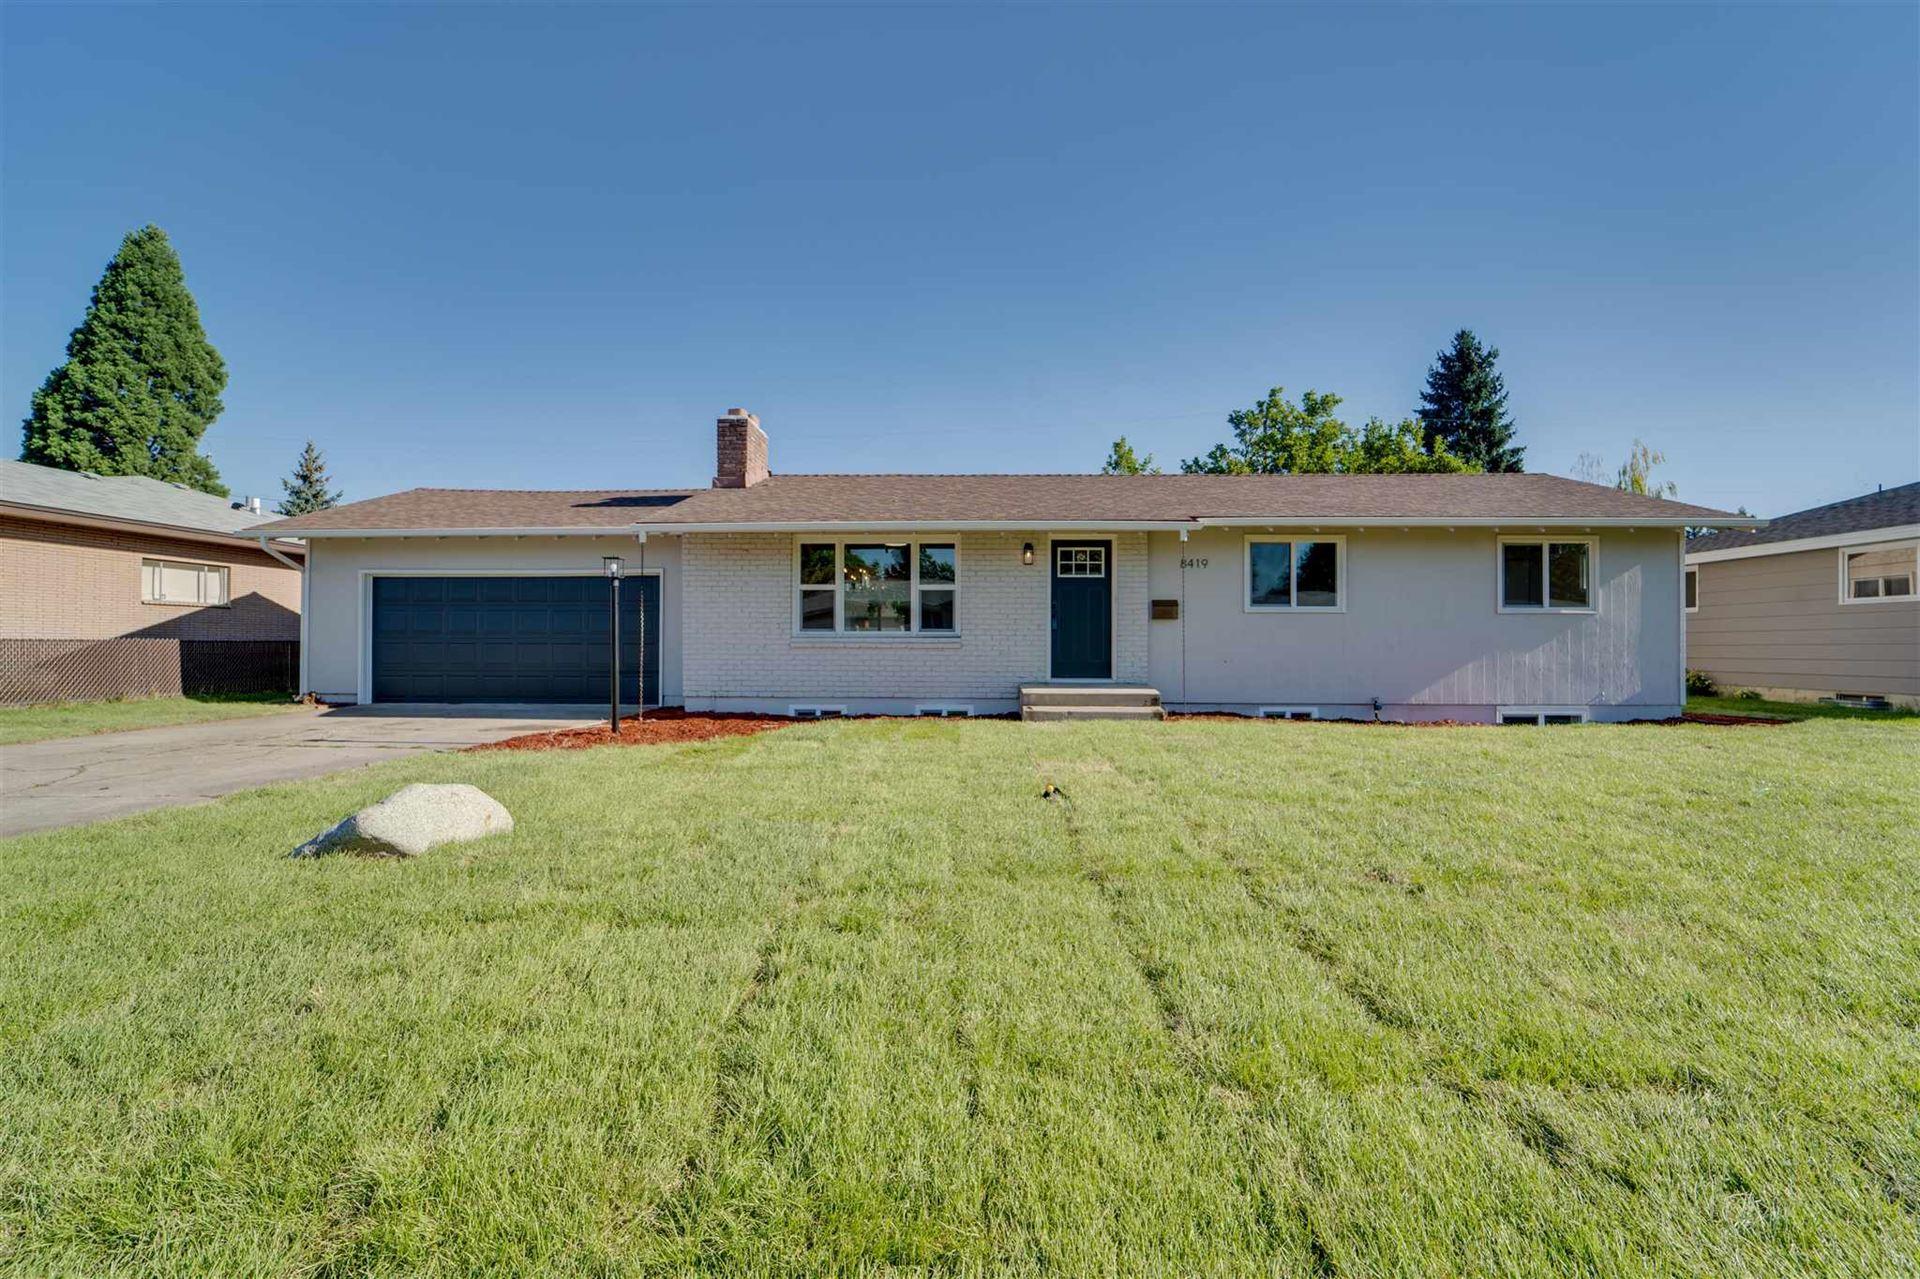 8419 E Bridgeport Ave, Spokane Valley, WA 99212 - #: 202119362